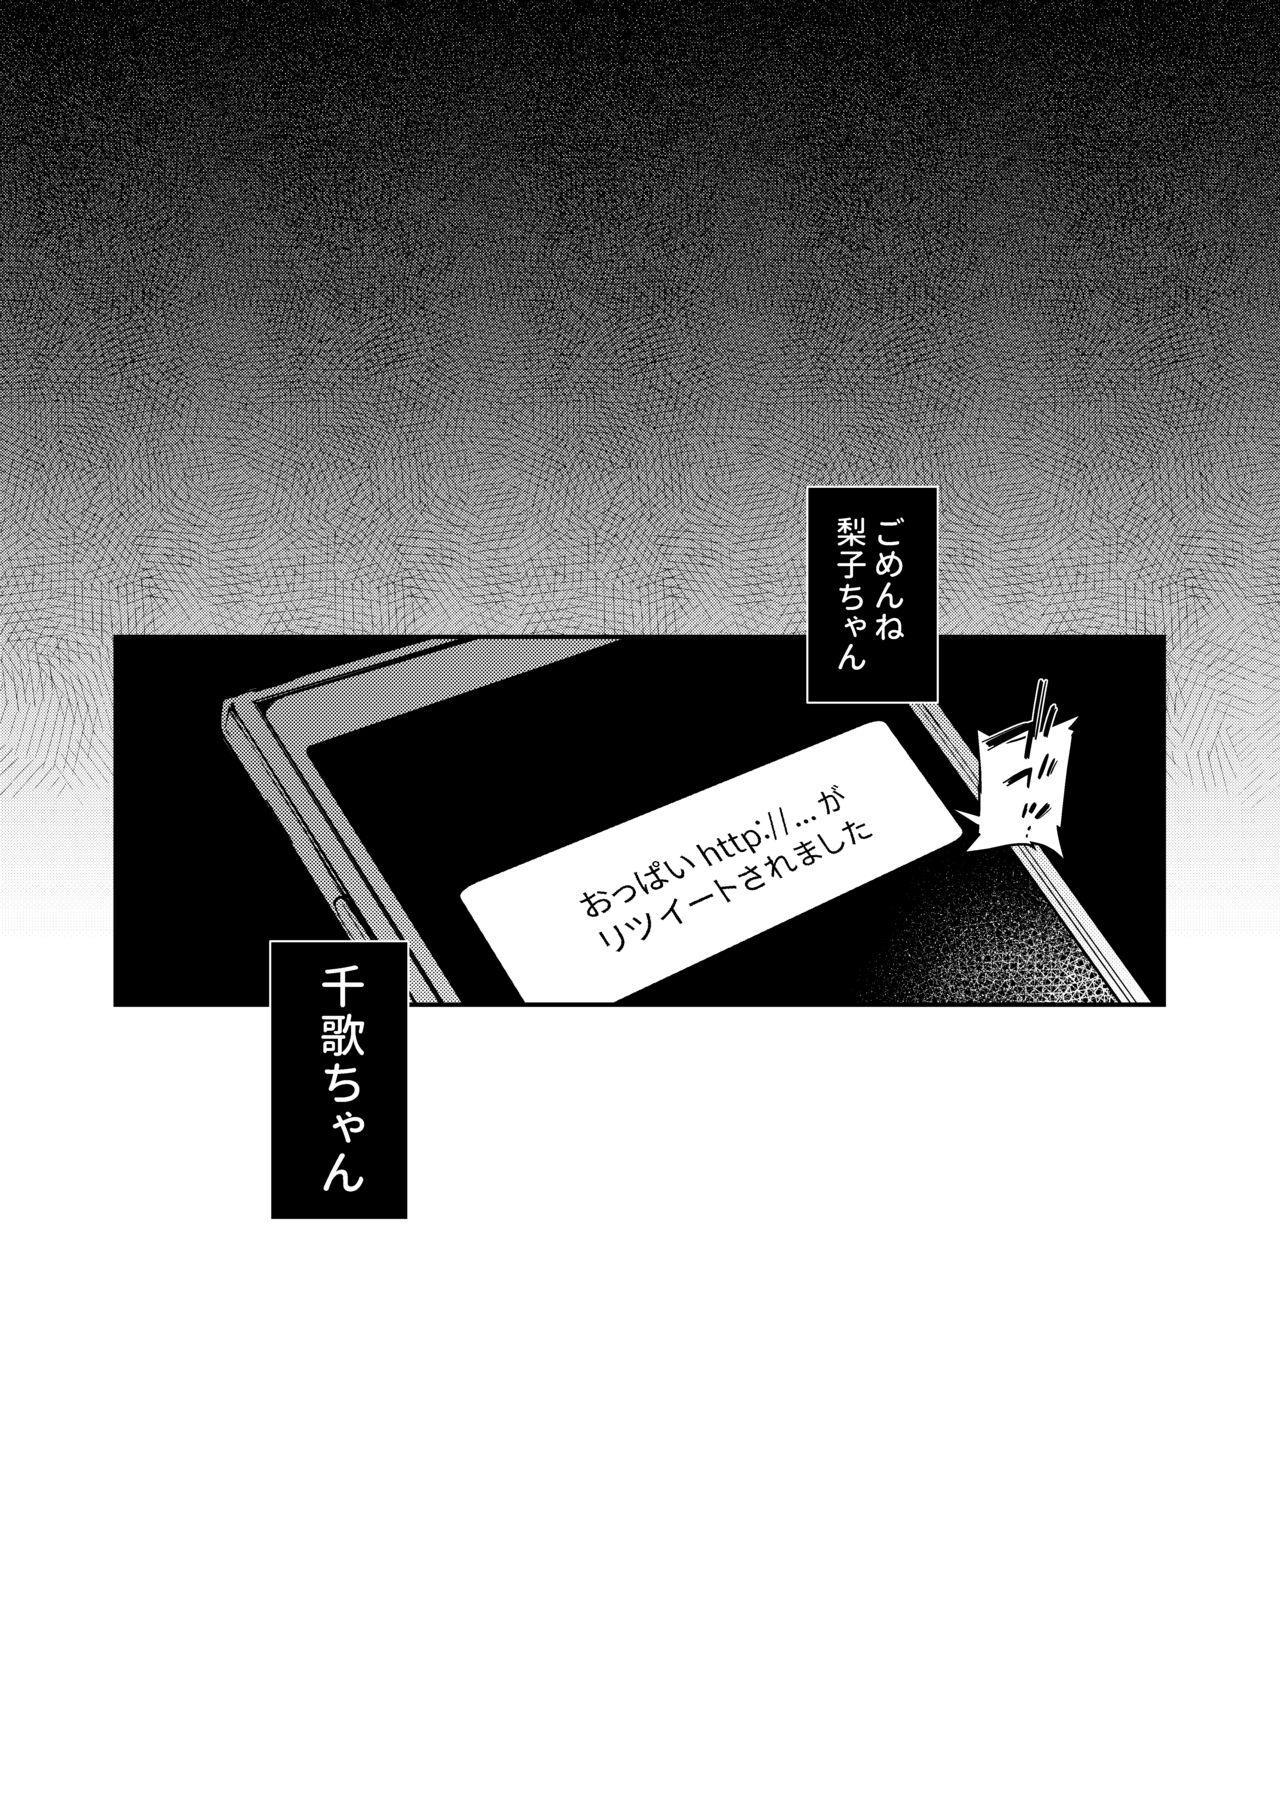 Ecchi Sketch Ro Ona Uchi. Soushuuhen 59